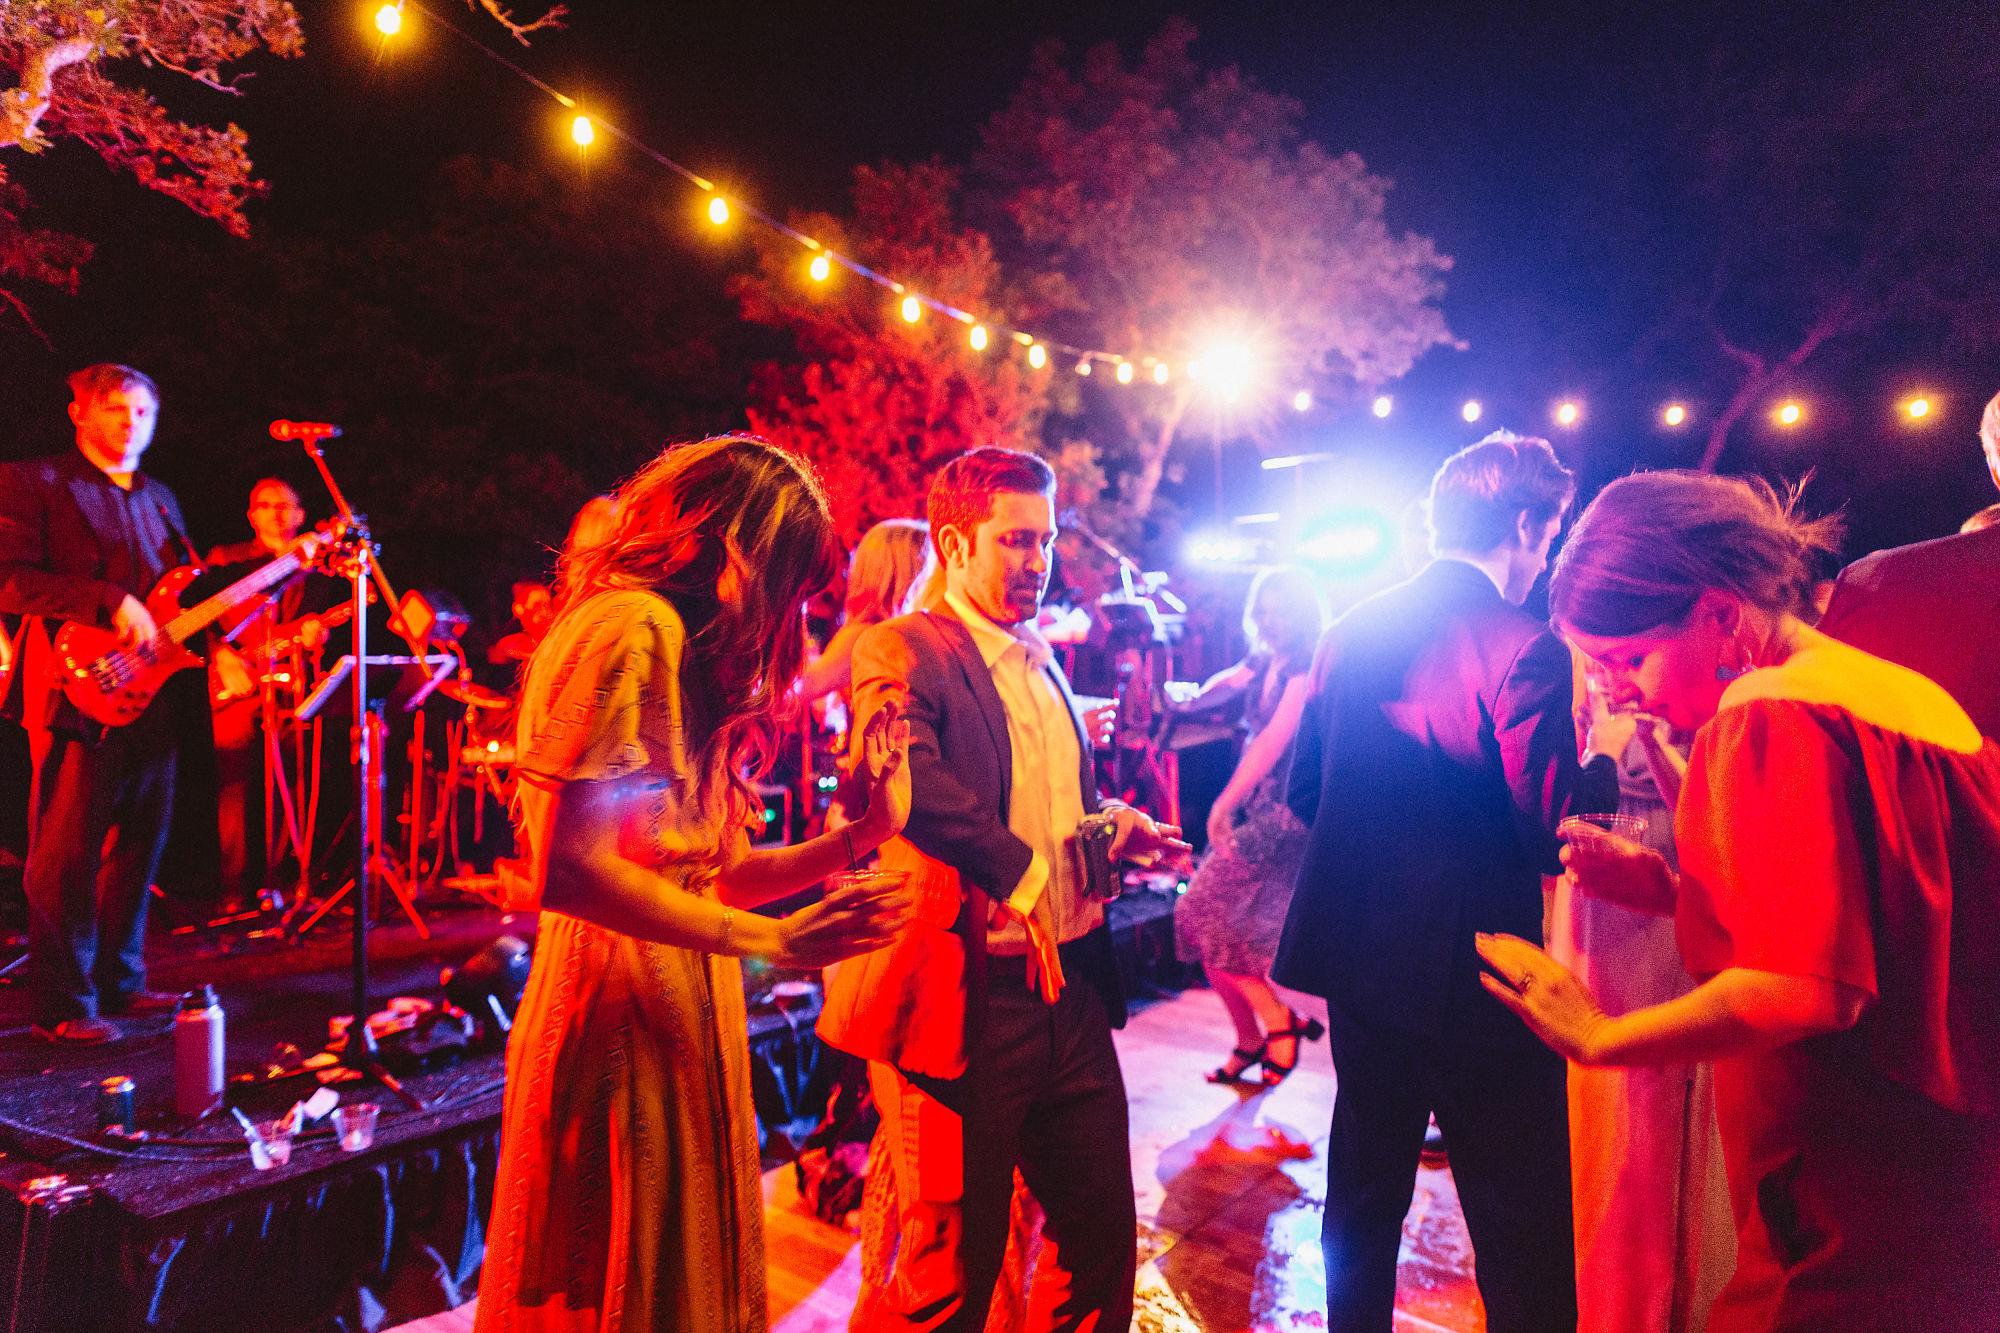 molly_jac_austin_wedding_photos202124.jpg